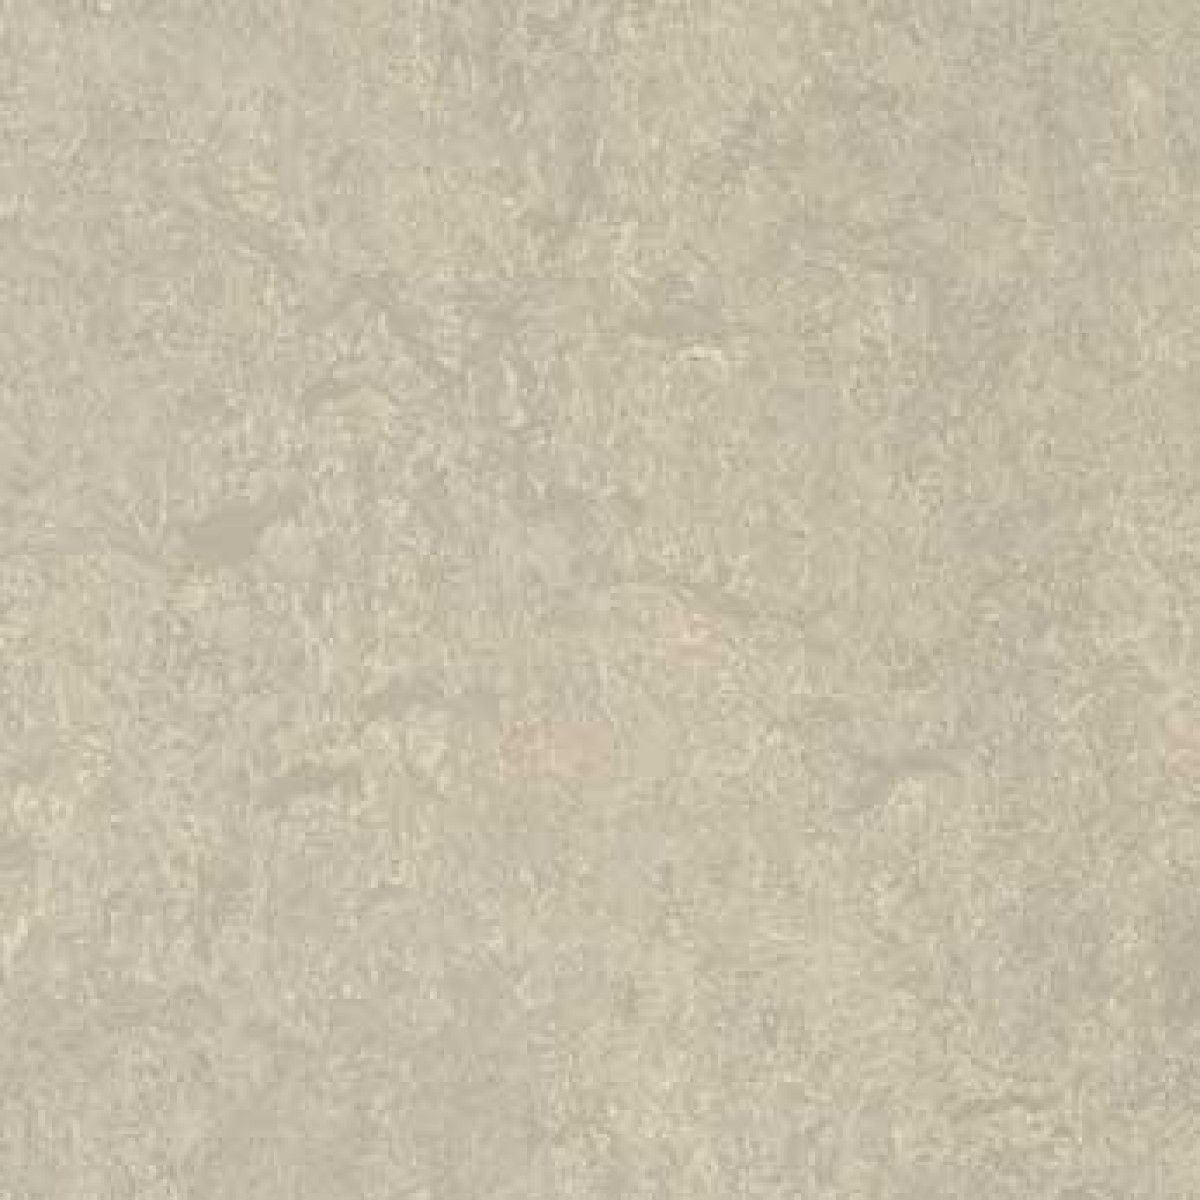 Forbo Real Marmoleum 2.5mm Colour 3136 Concrete. * JUST £